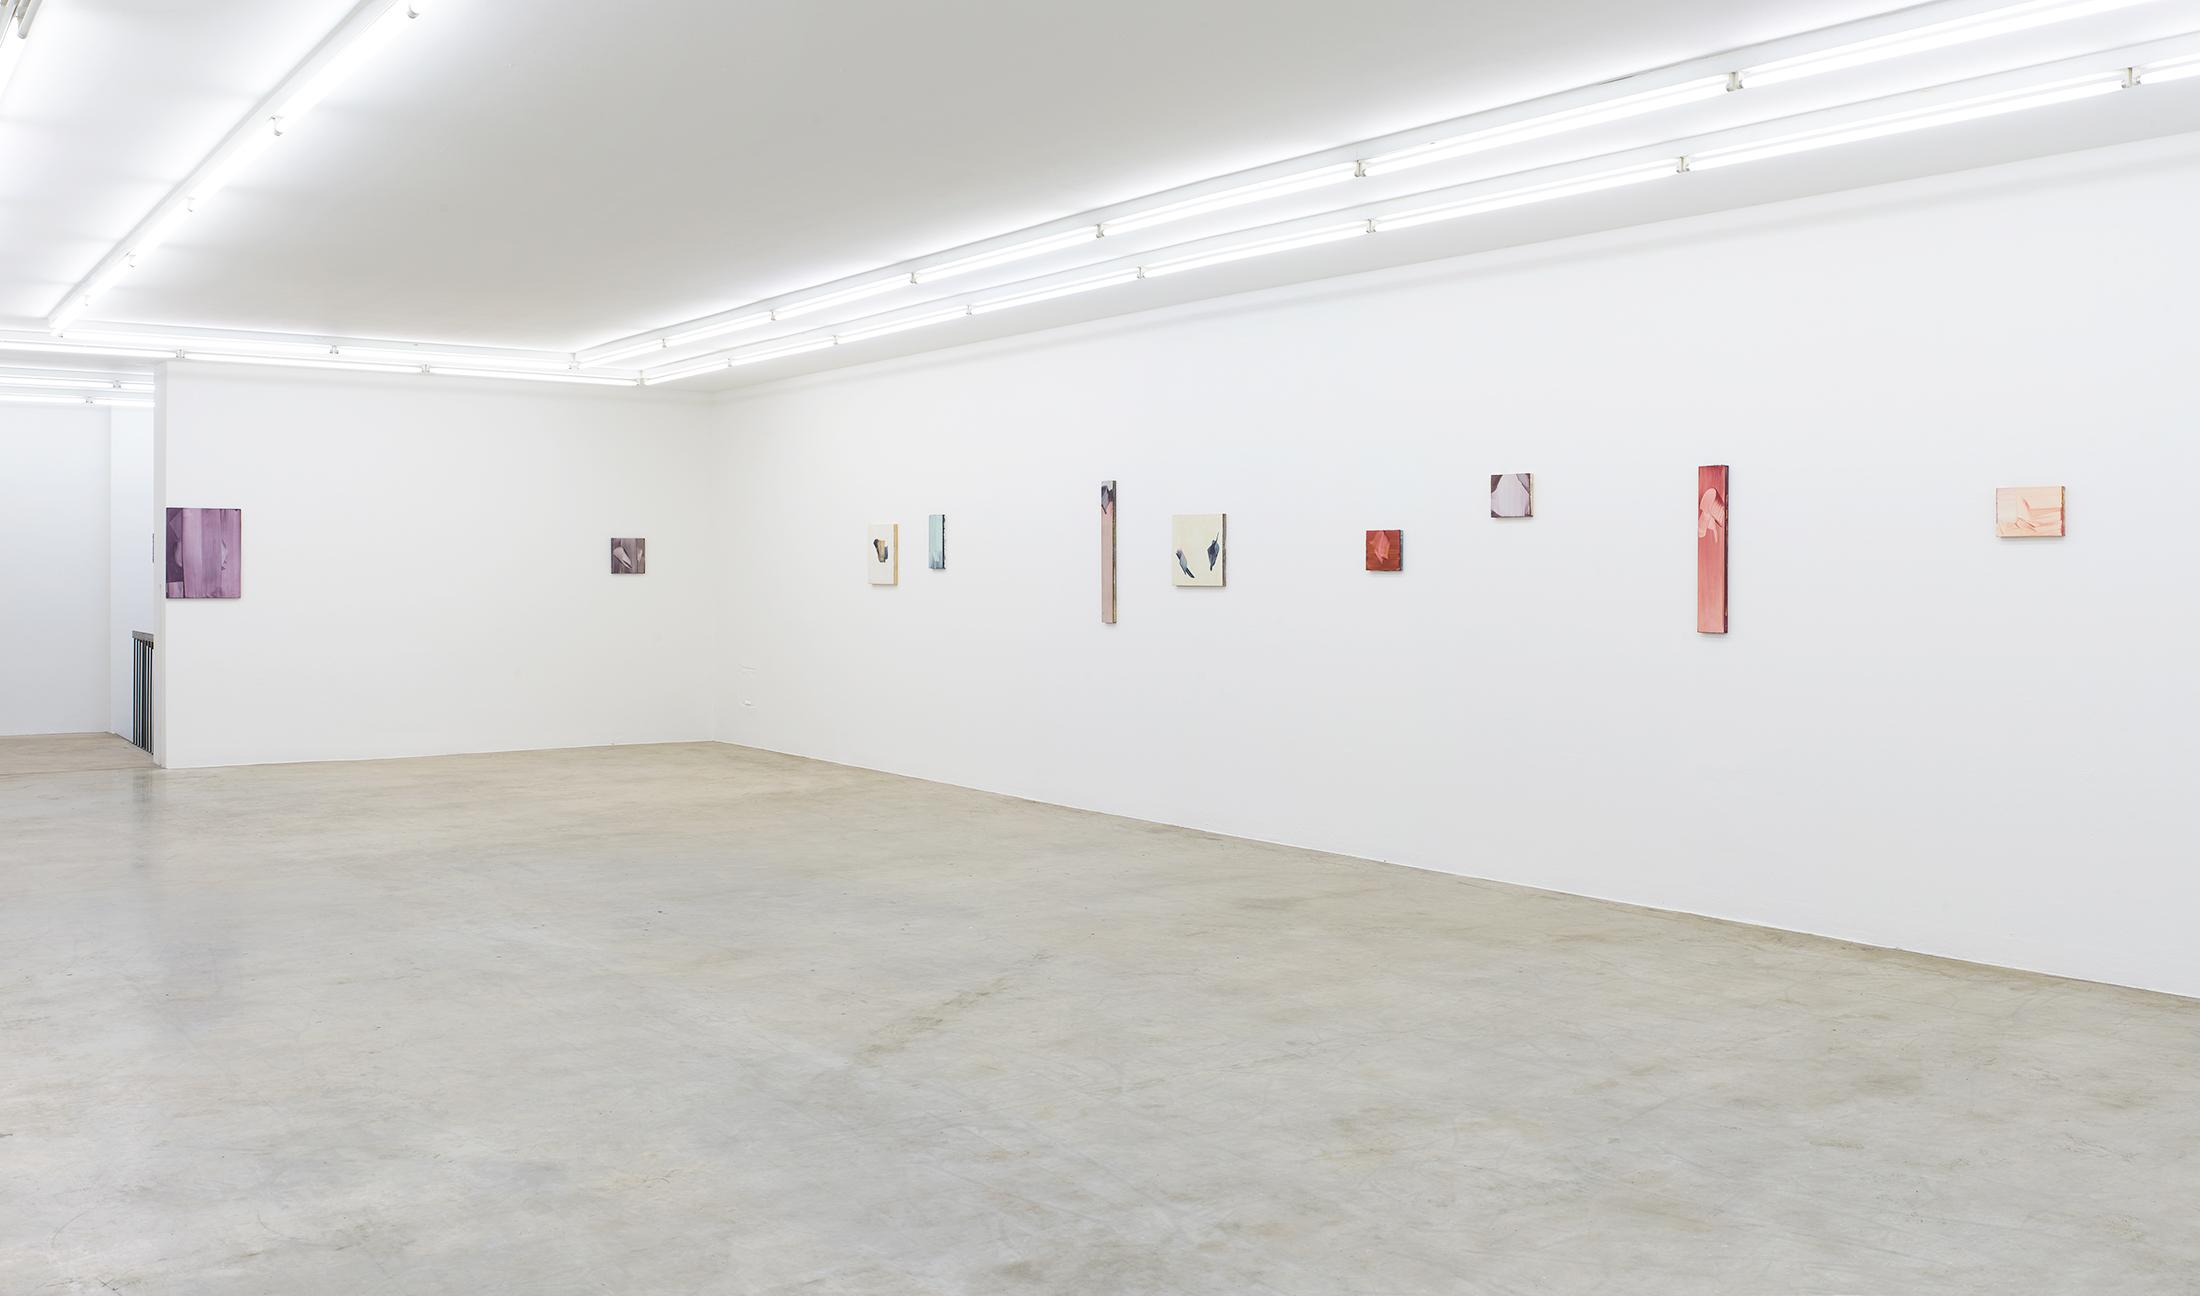 neuer aachener kunstverein, viewing room, munchies art club